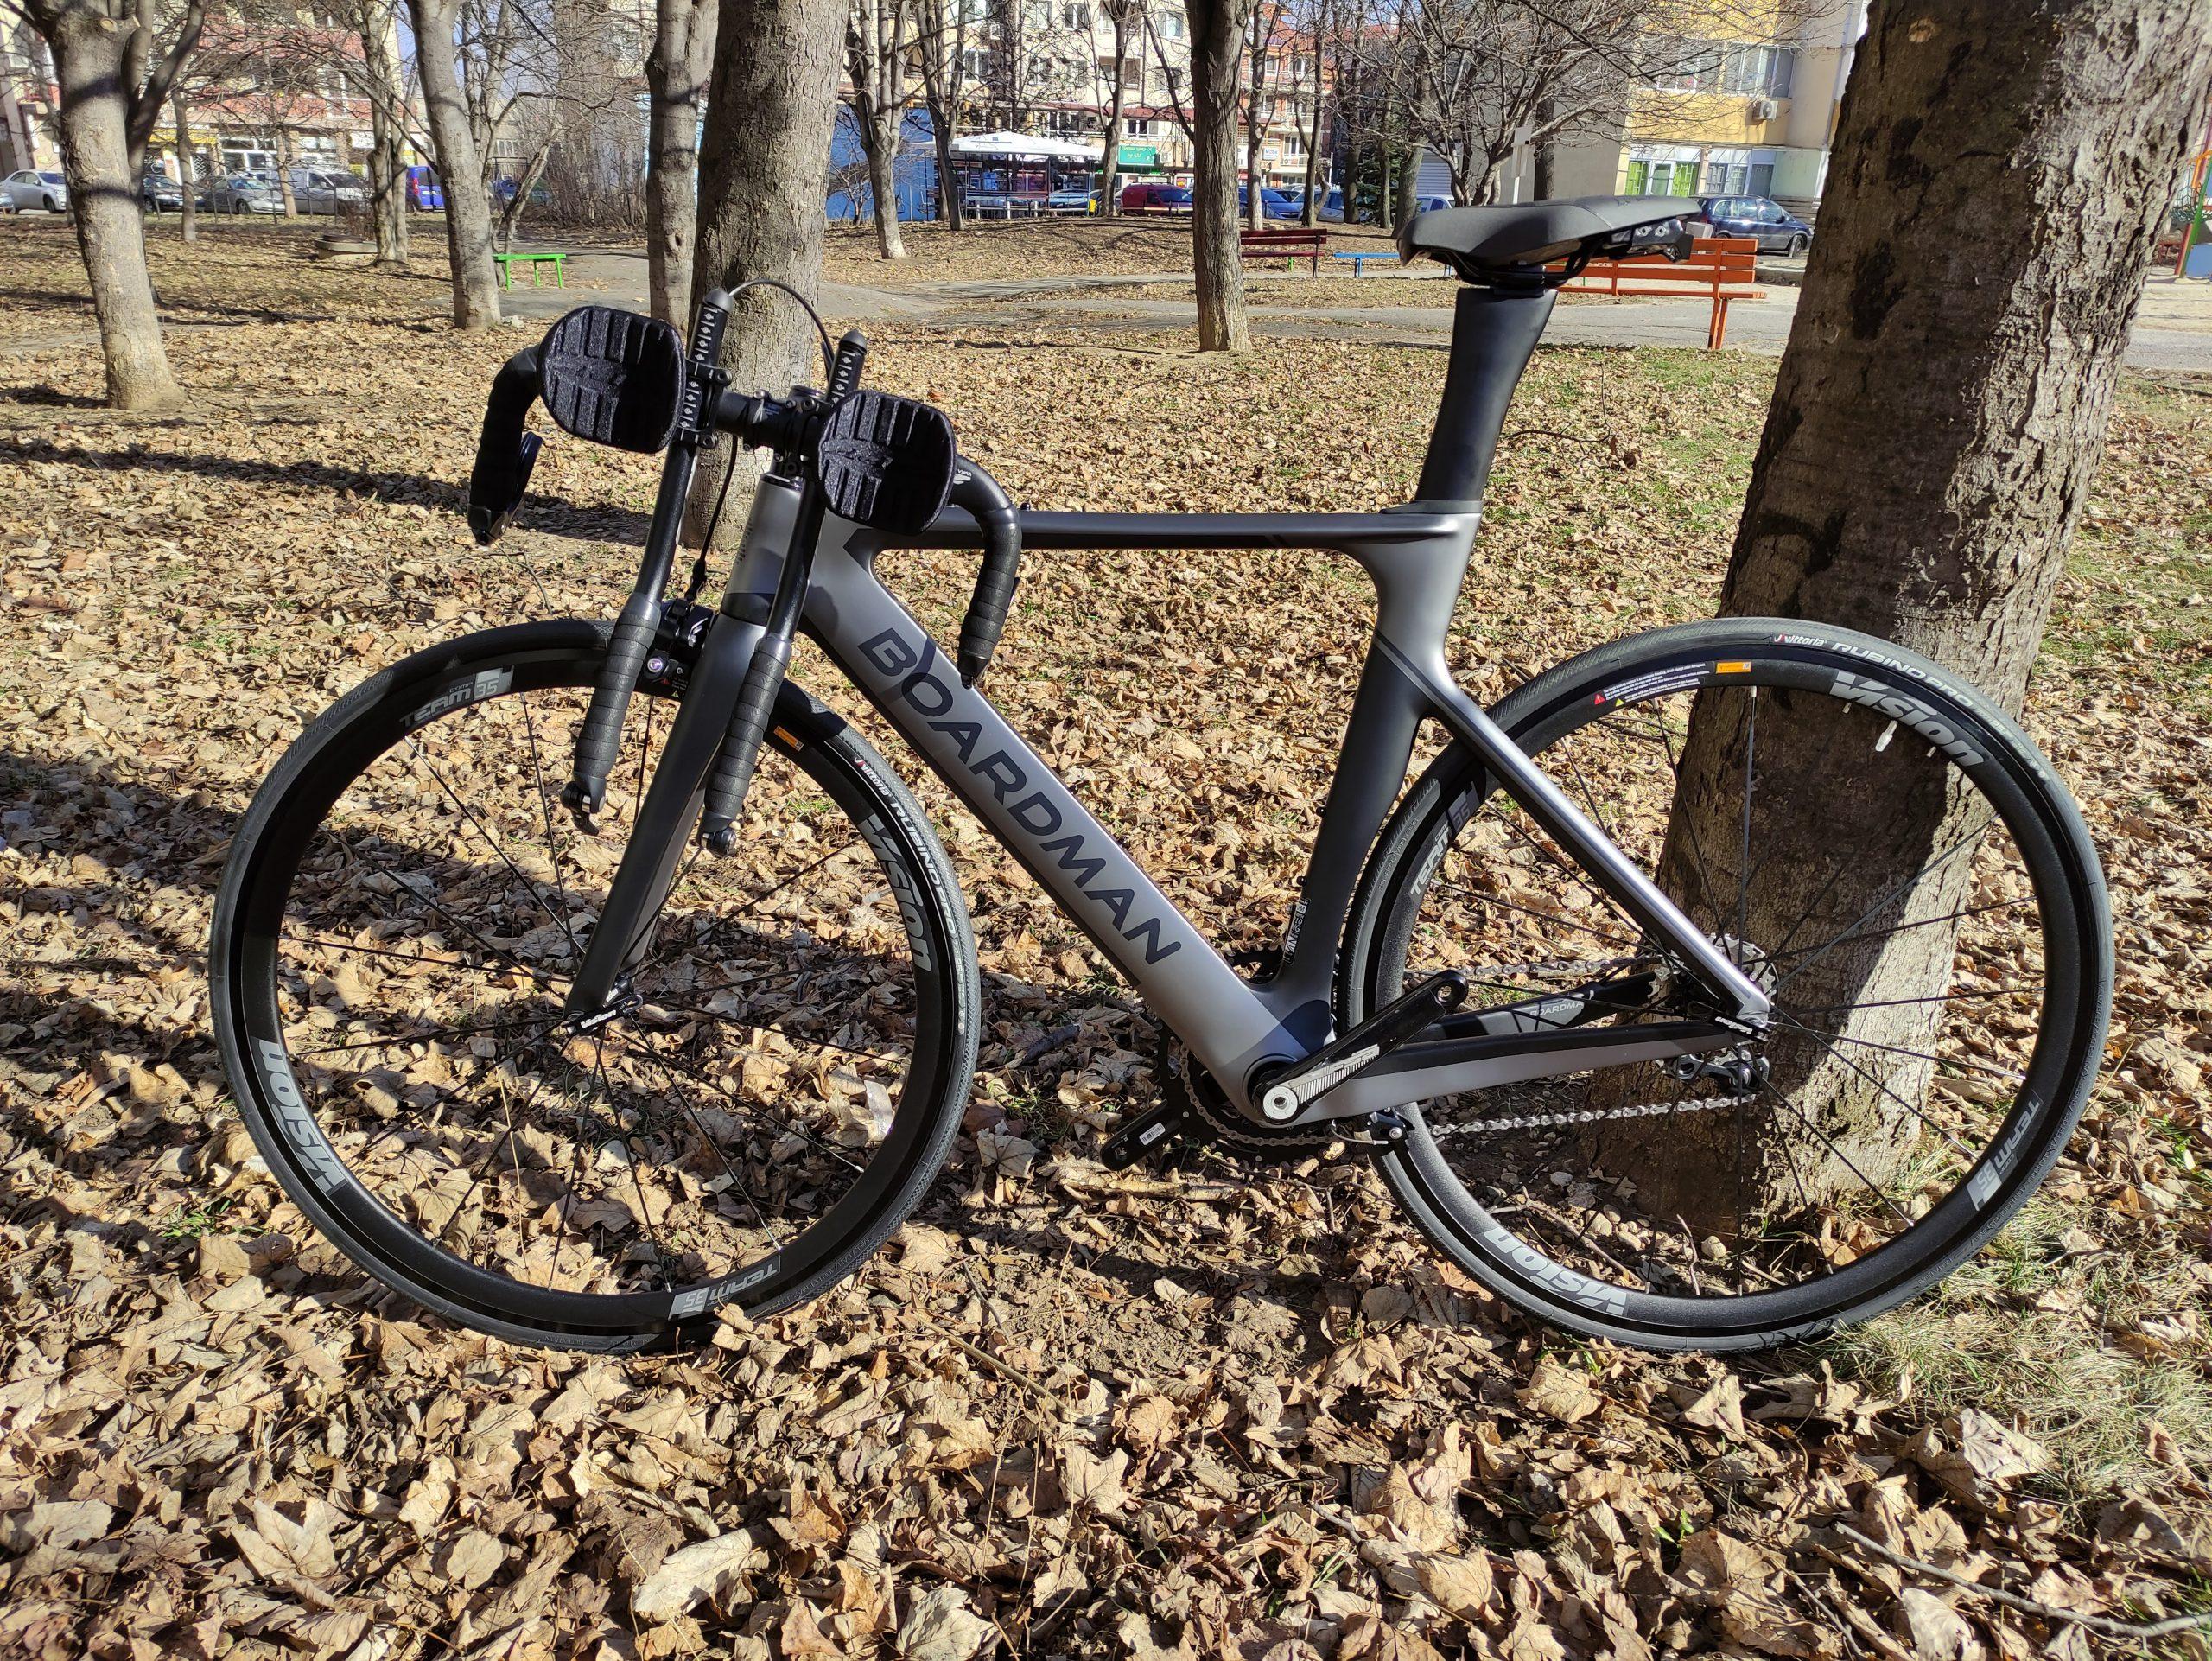 2019 Boardman ATT 9.0 шосеен ТТ велосипед